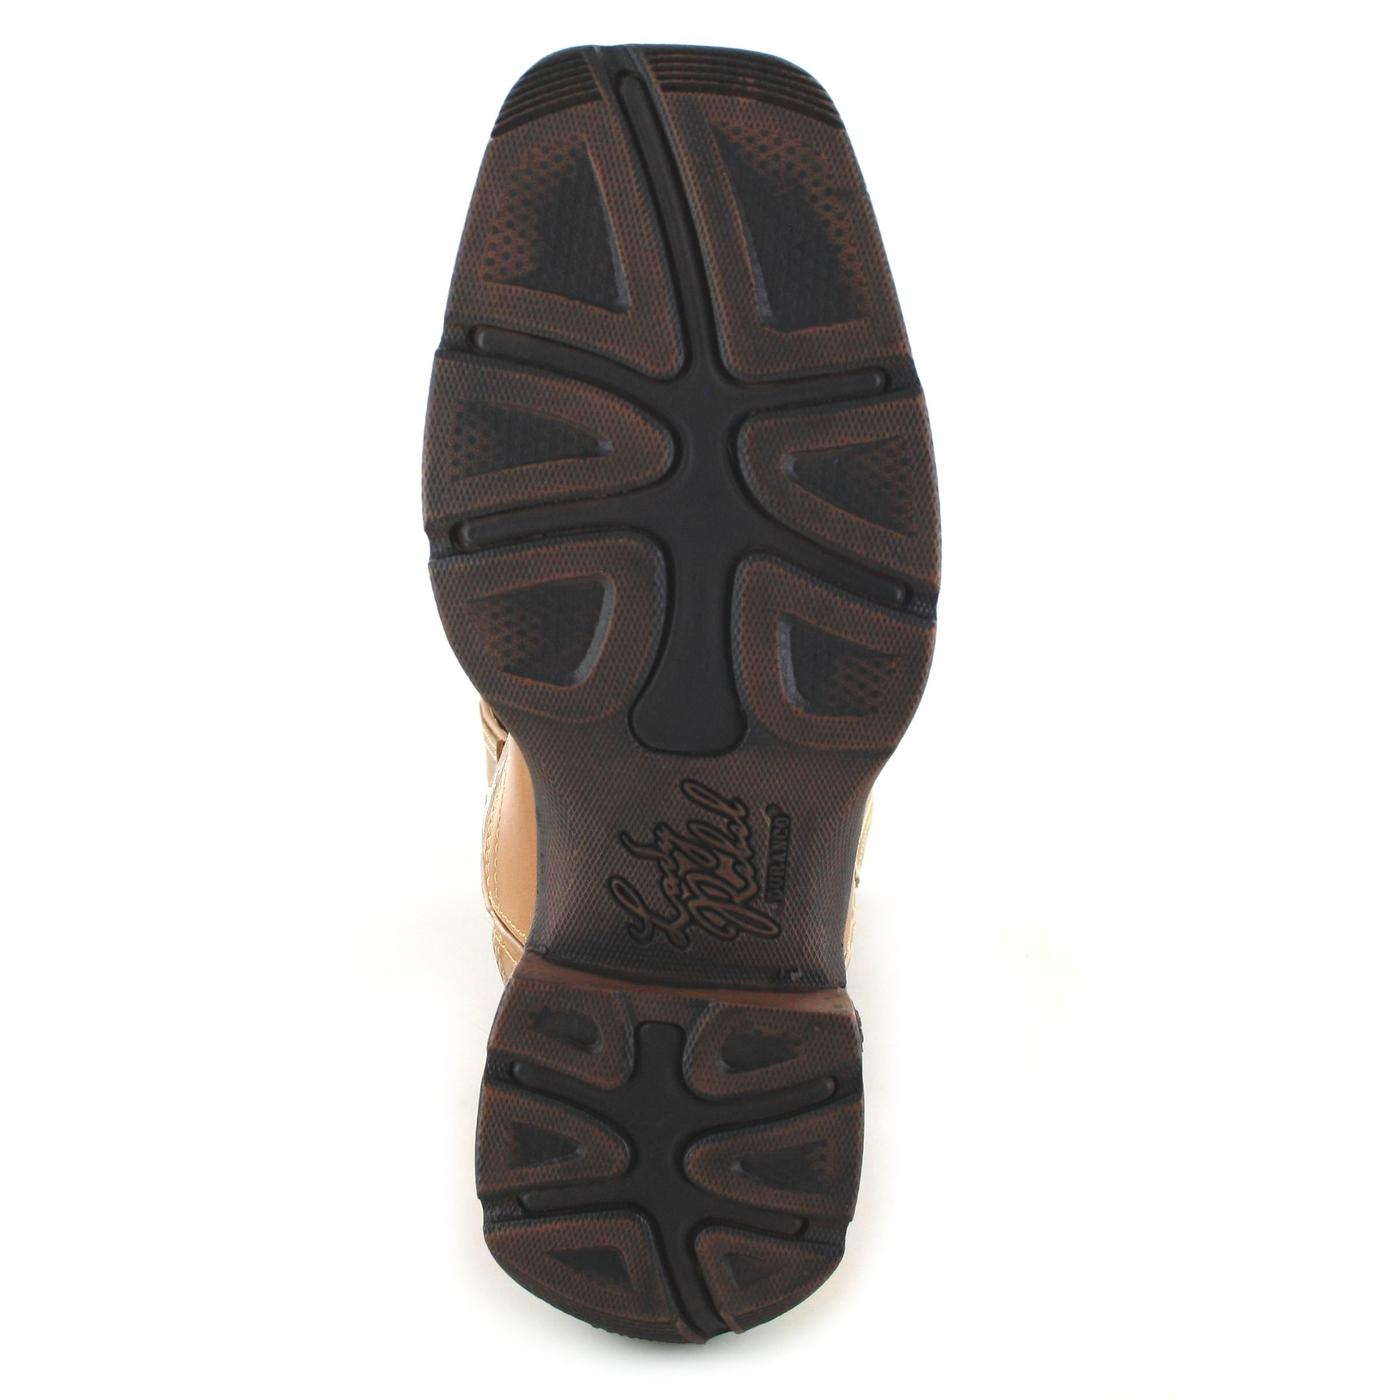 Durango Lady Braun Boots Drd0107 Brown Rebel Westernreitstiefel Y76yfgvb